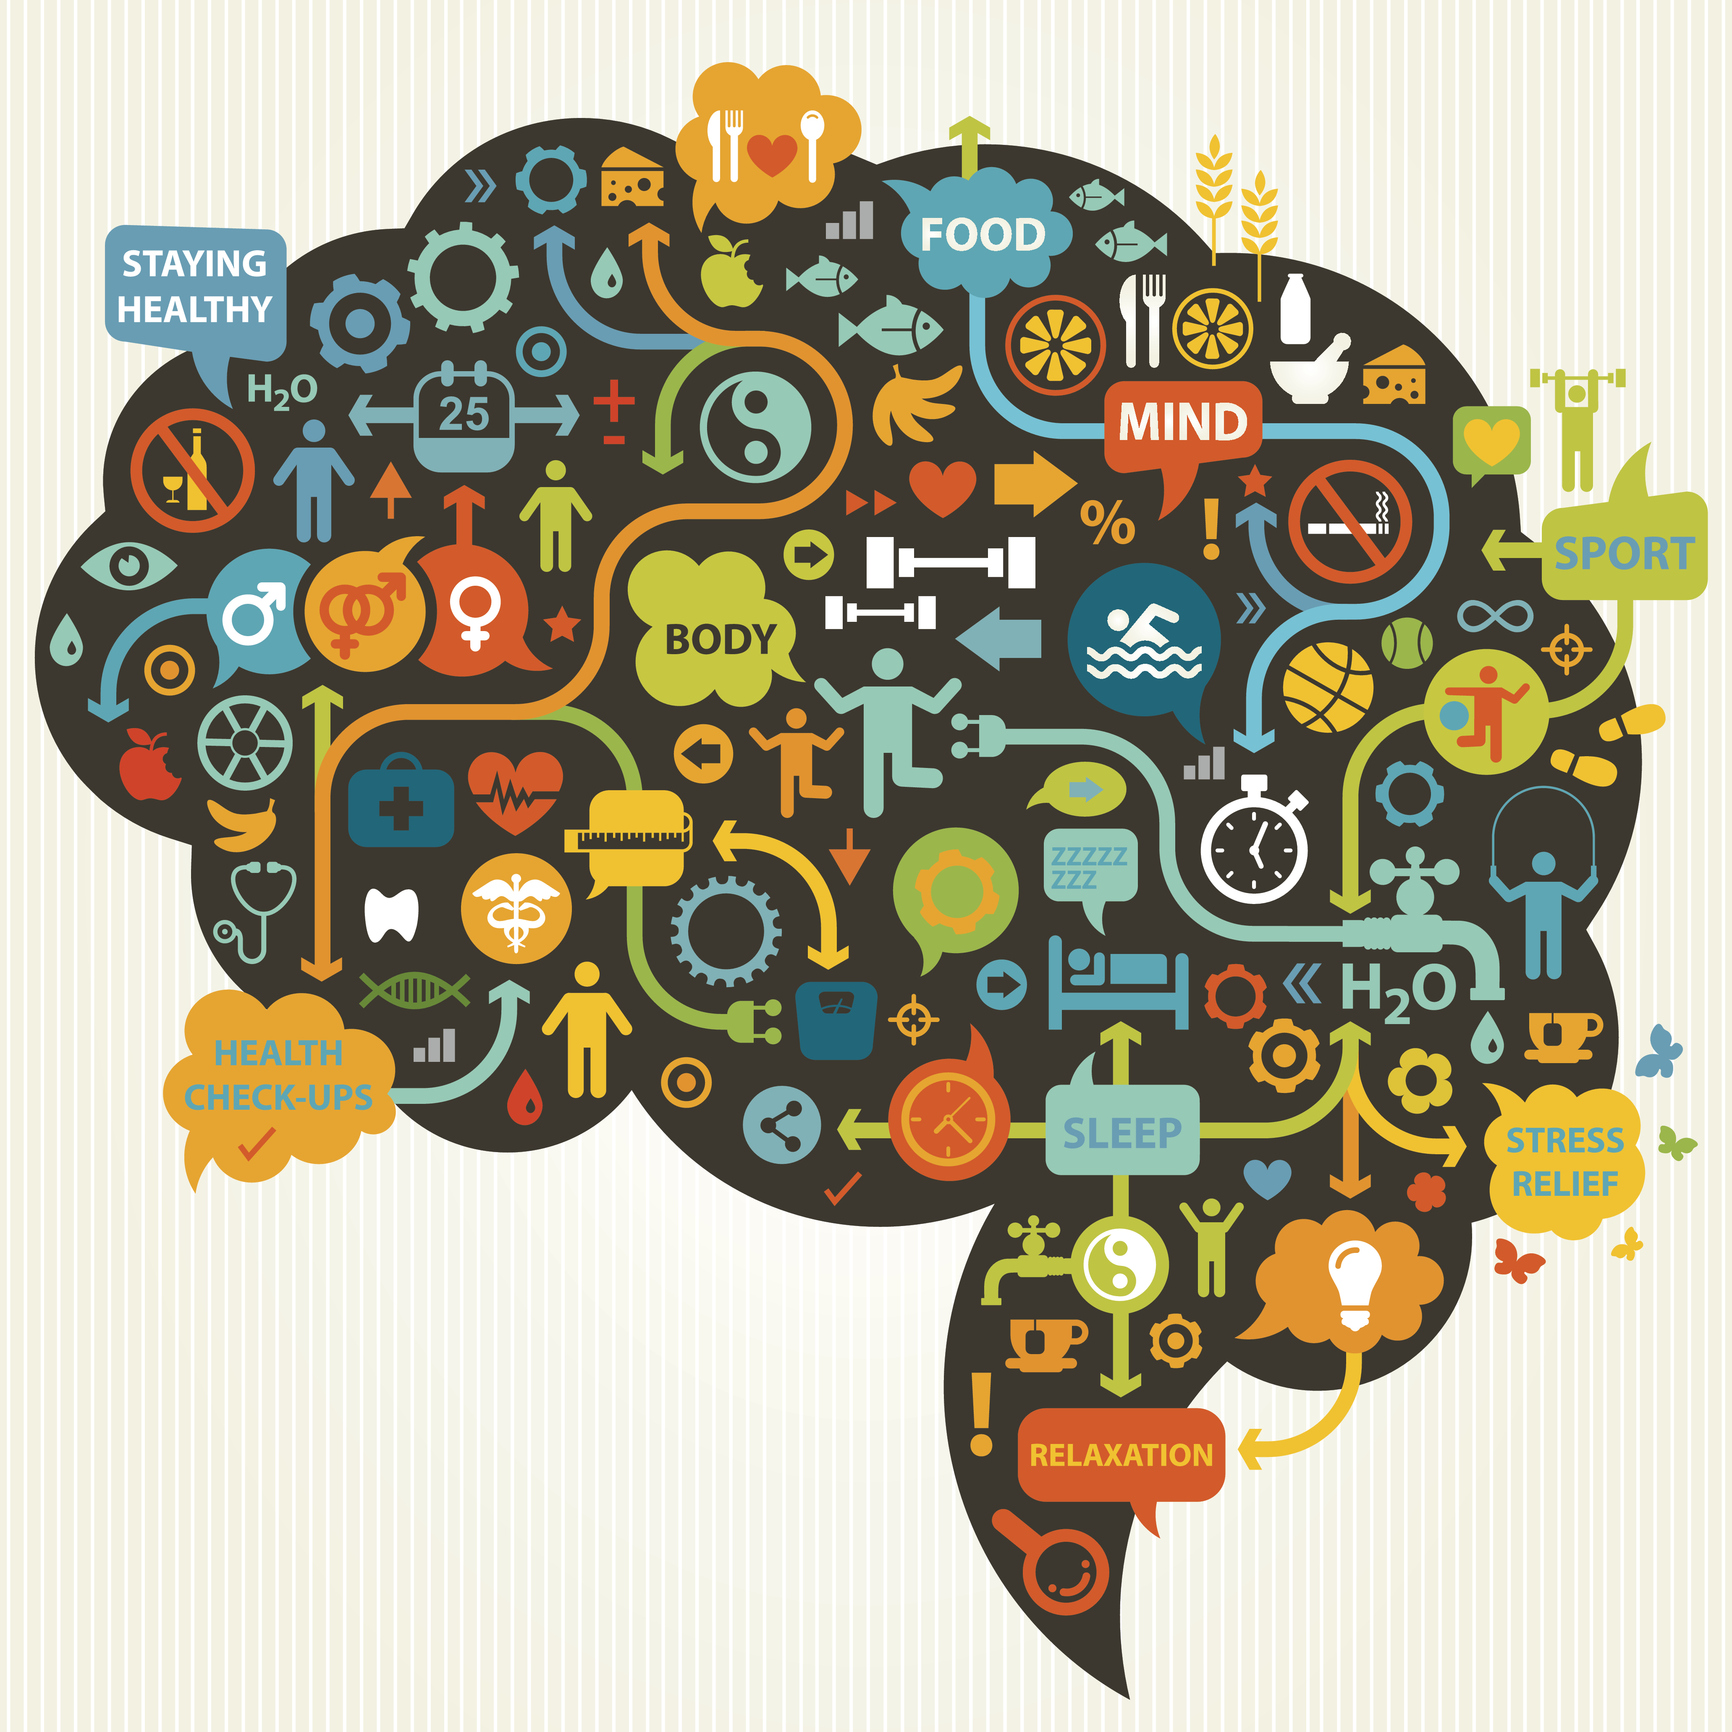 iStock-482953761_Brain Health